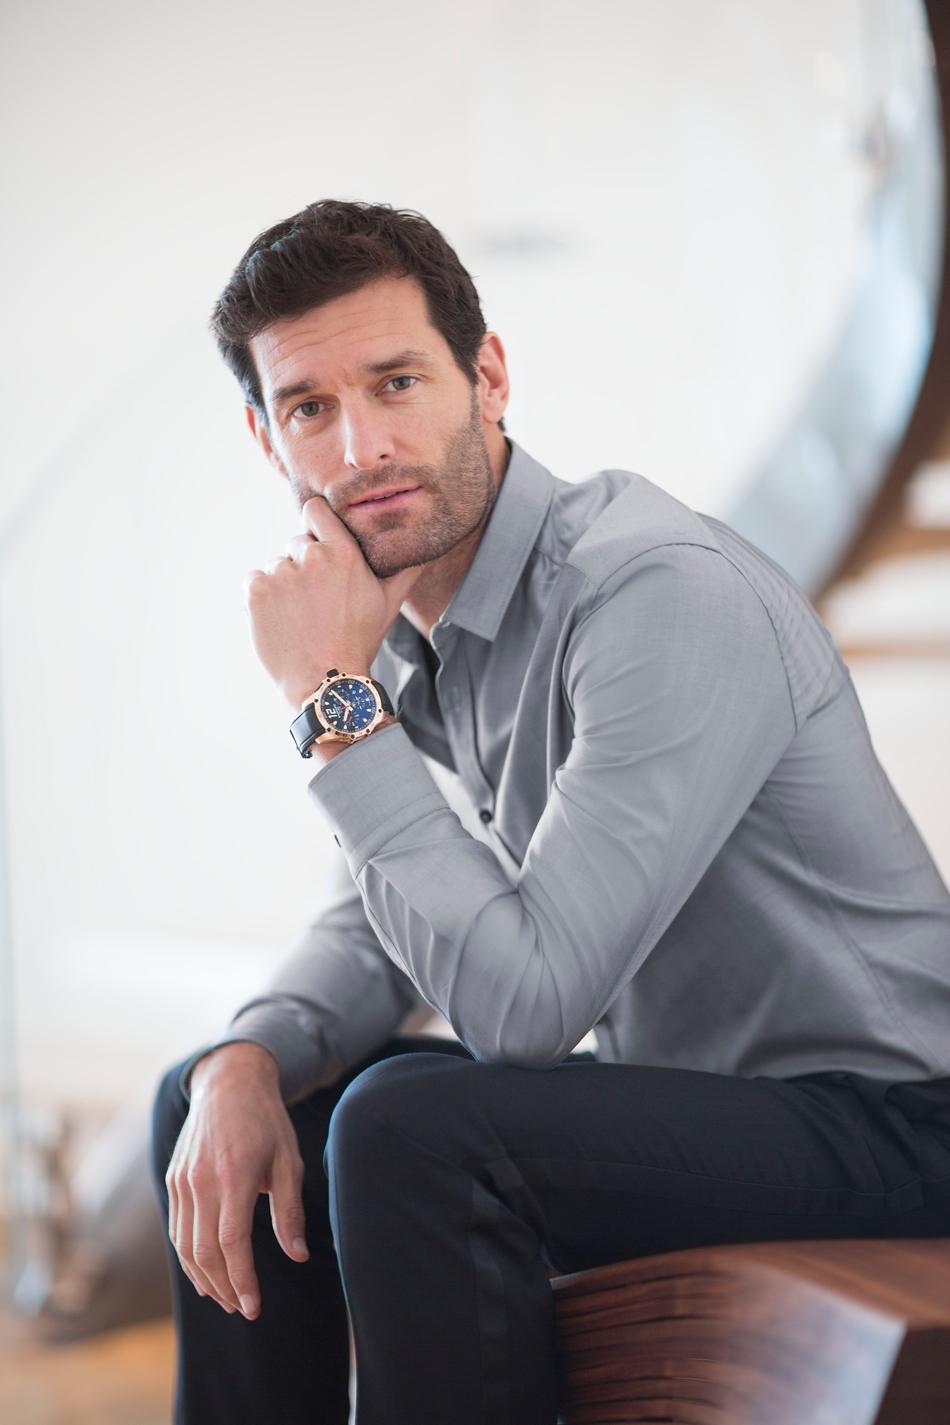 Mark-Webber-wearing-the-Superfast-Chrono-Rose-gold-JohannSauty-Chopard